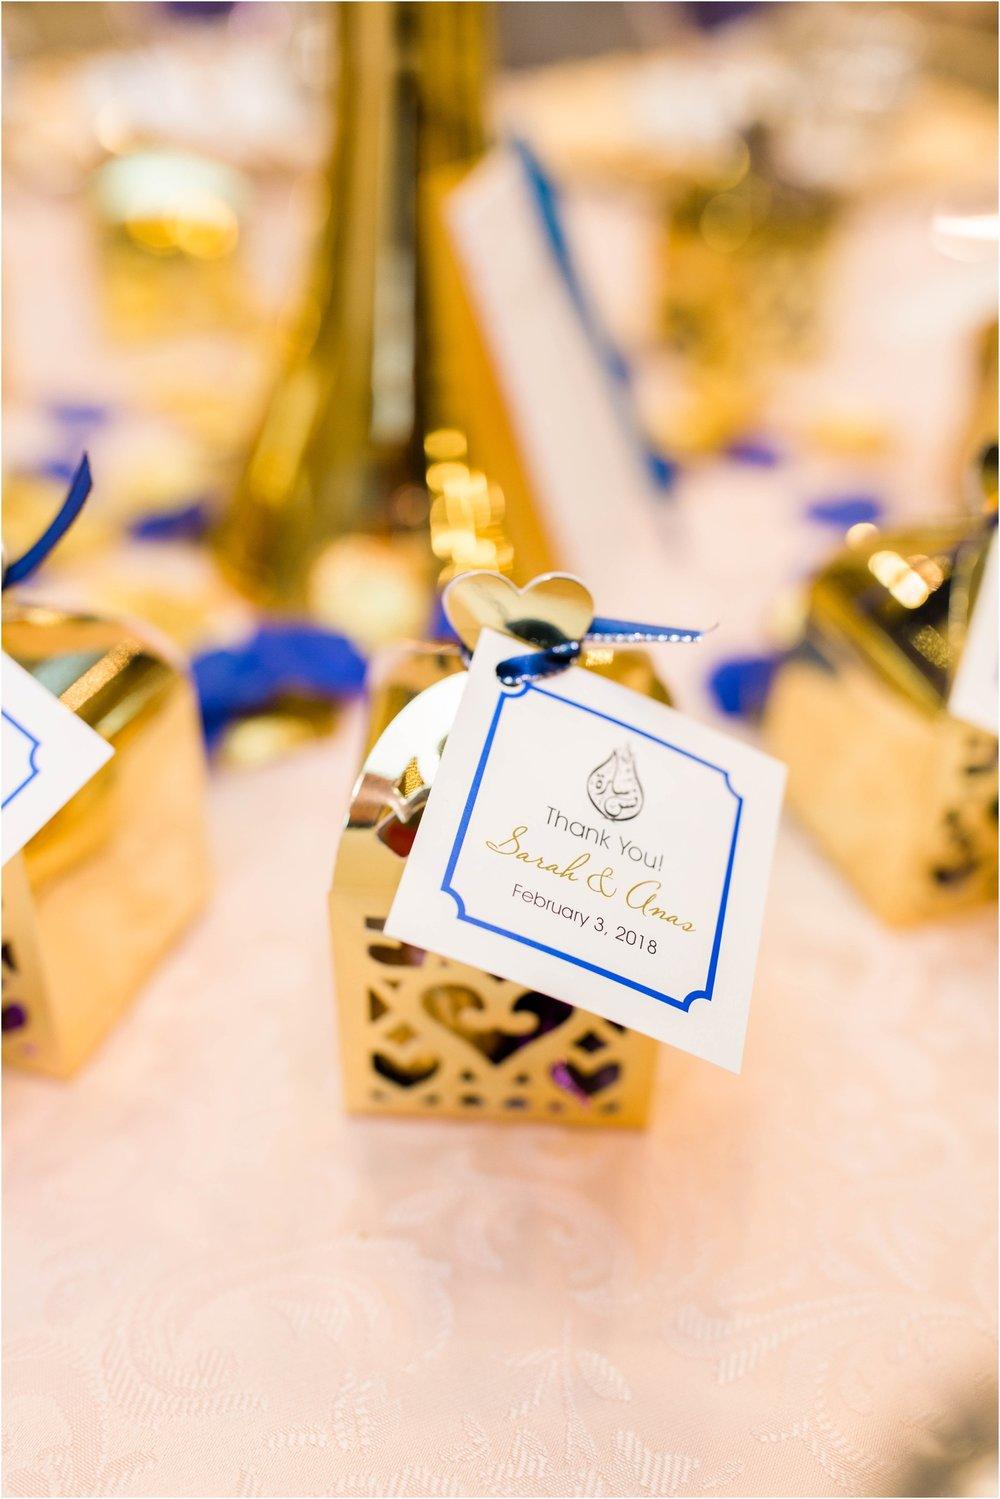 Estate-Banquet-Hall-Wedding-Toronto-Mississauga-Brampton-Scarborough-GTA-Pakistani-Indian-Wedding-Engagement-Photographer-Photography_0016.jpg